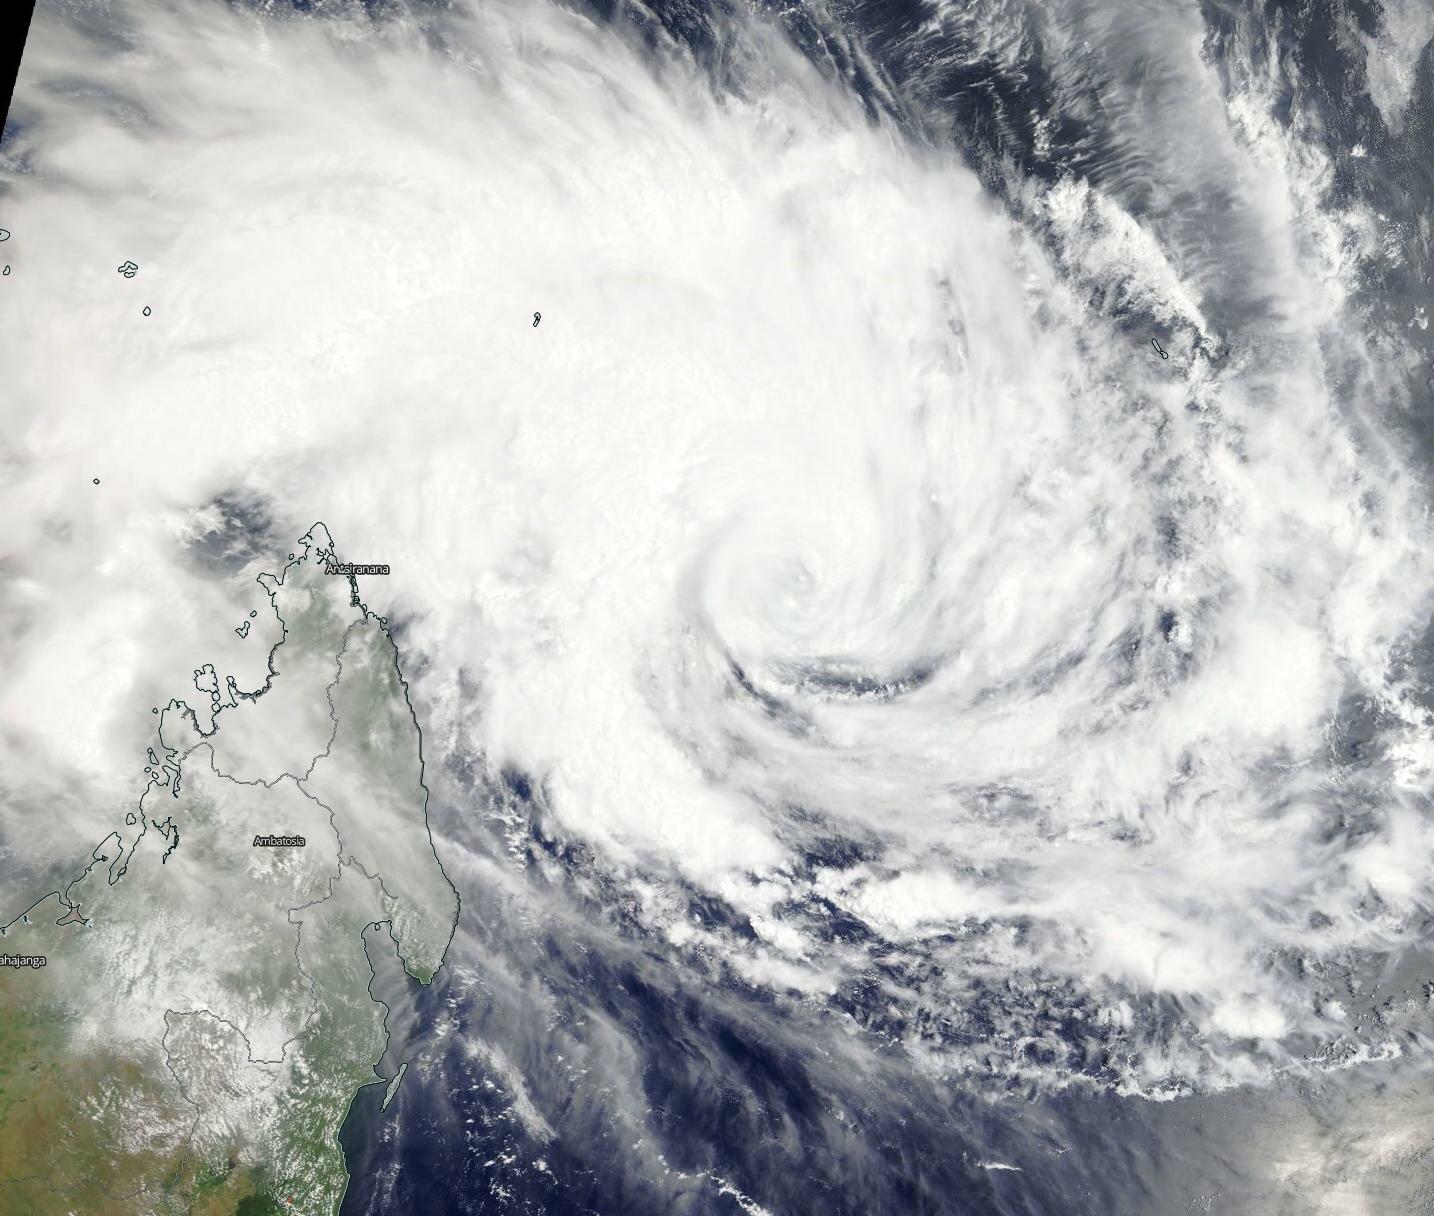 NASA satellite shows Tropical Cyclone Gelena near Madagascar